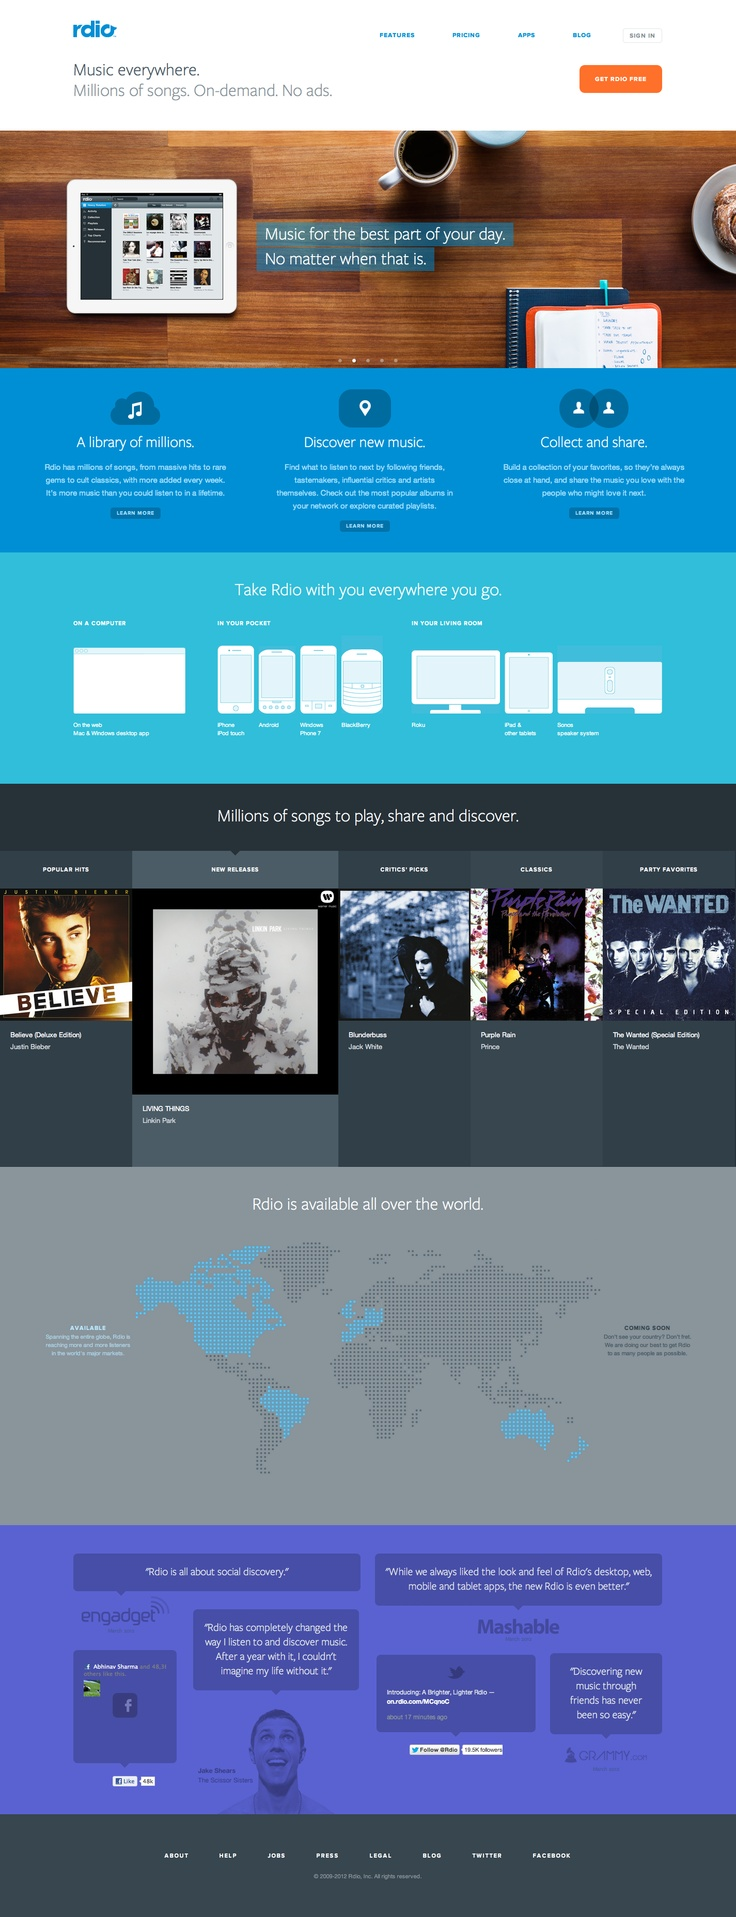 Rdio's new homepage.